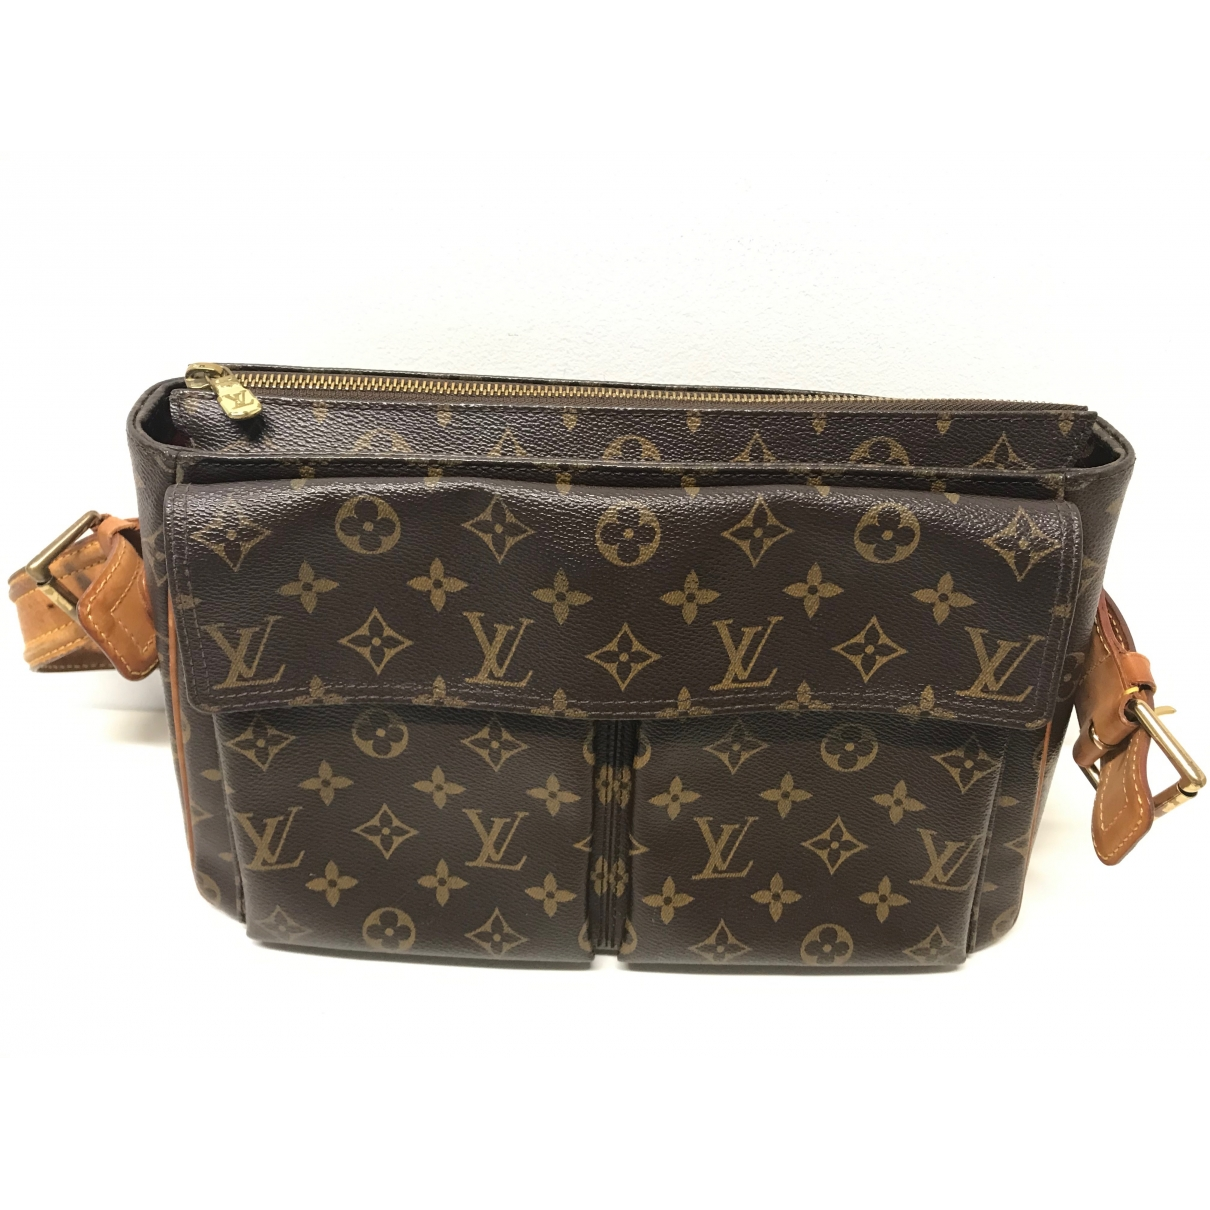 Louis Vuitton Viva Cité Brown Cloth handbag for Women \N